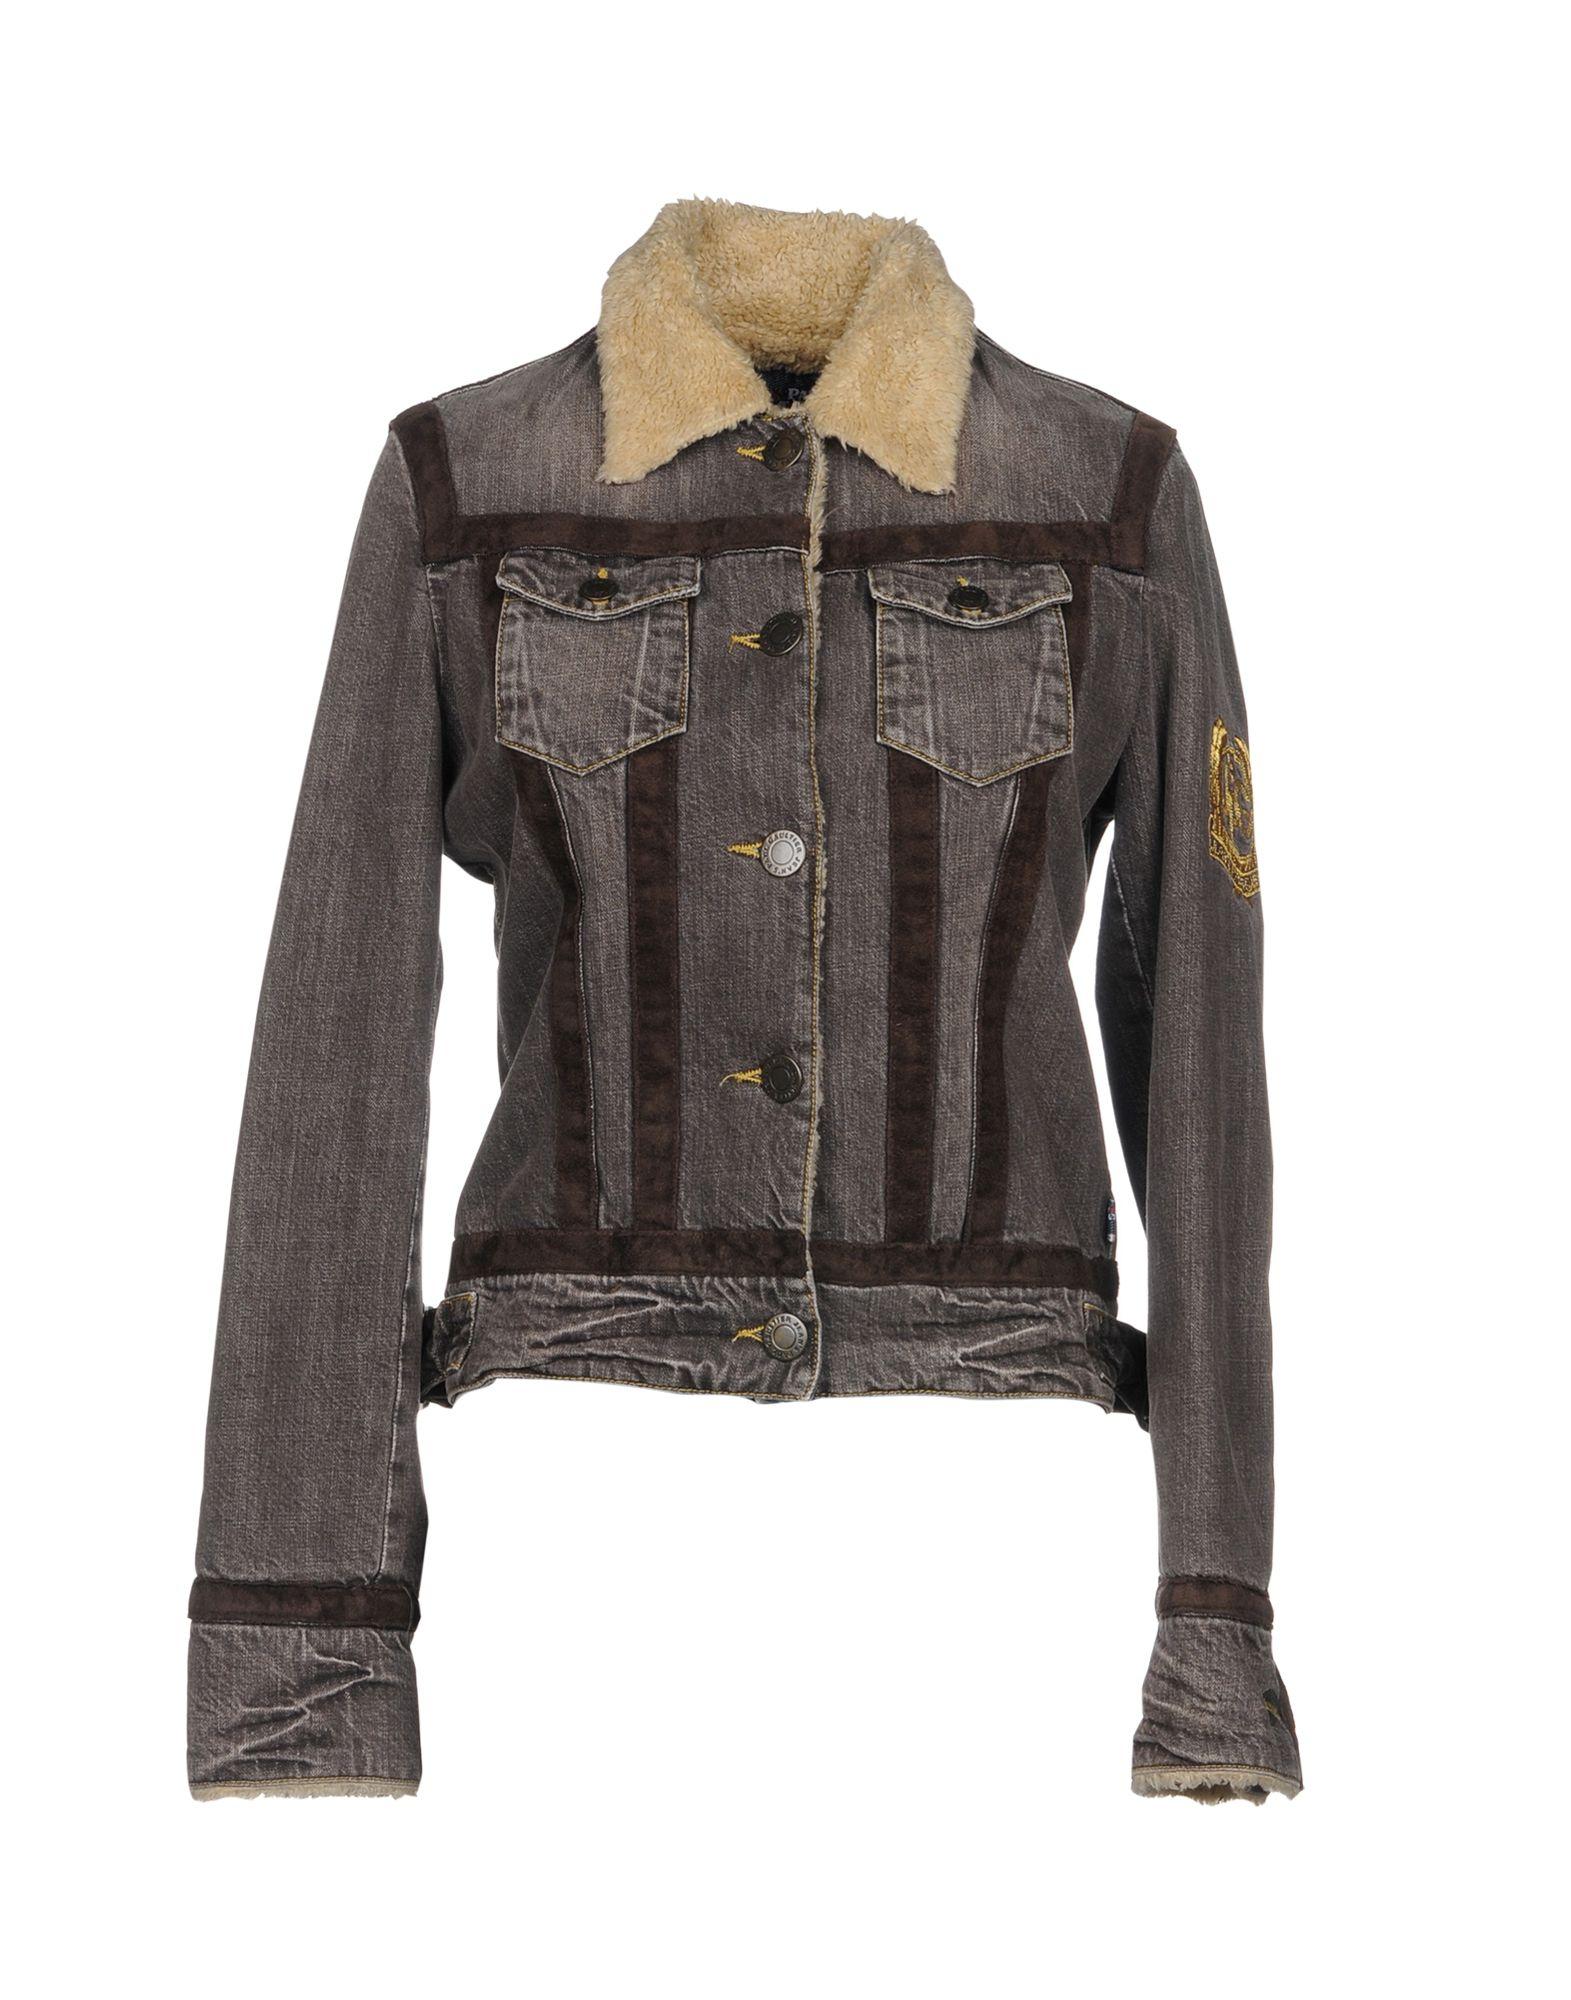 JEAN PAUL GAULTIER Джинсовая верхняя одежда jean paul gaultier vintage куртка из денима 90е